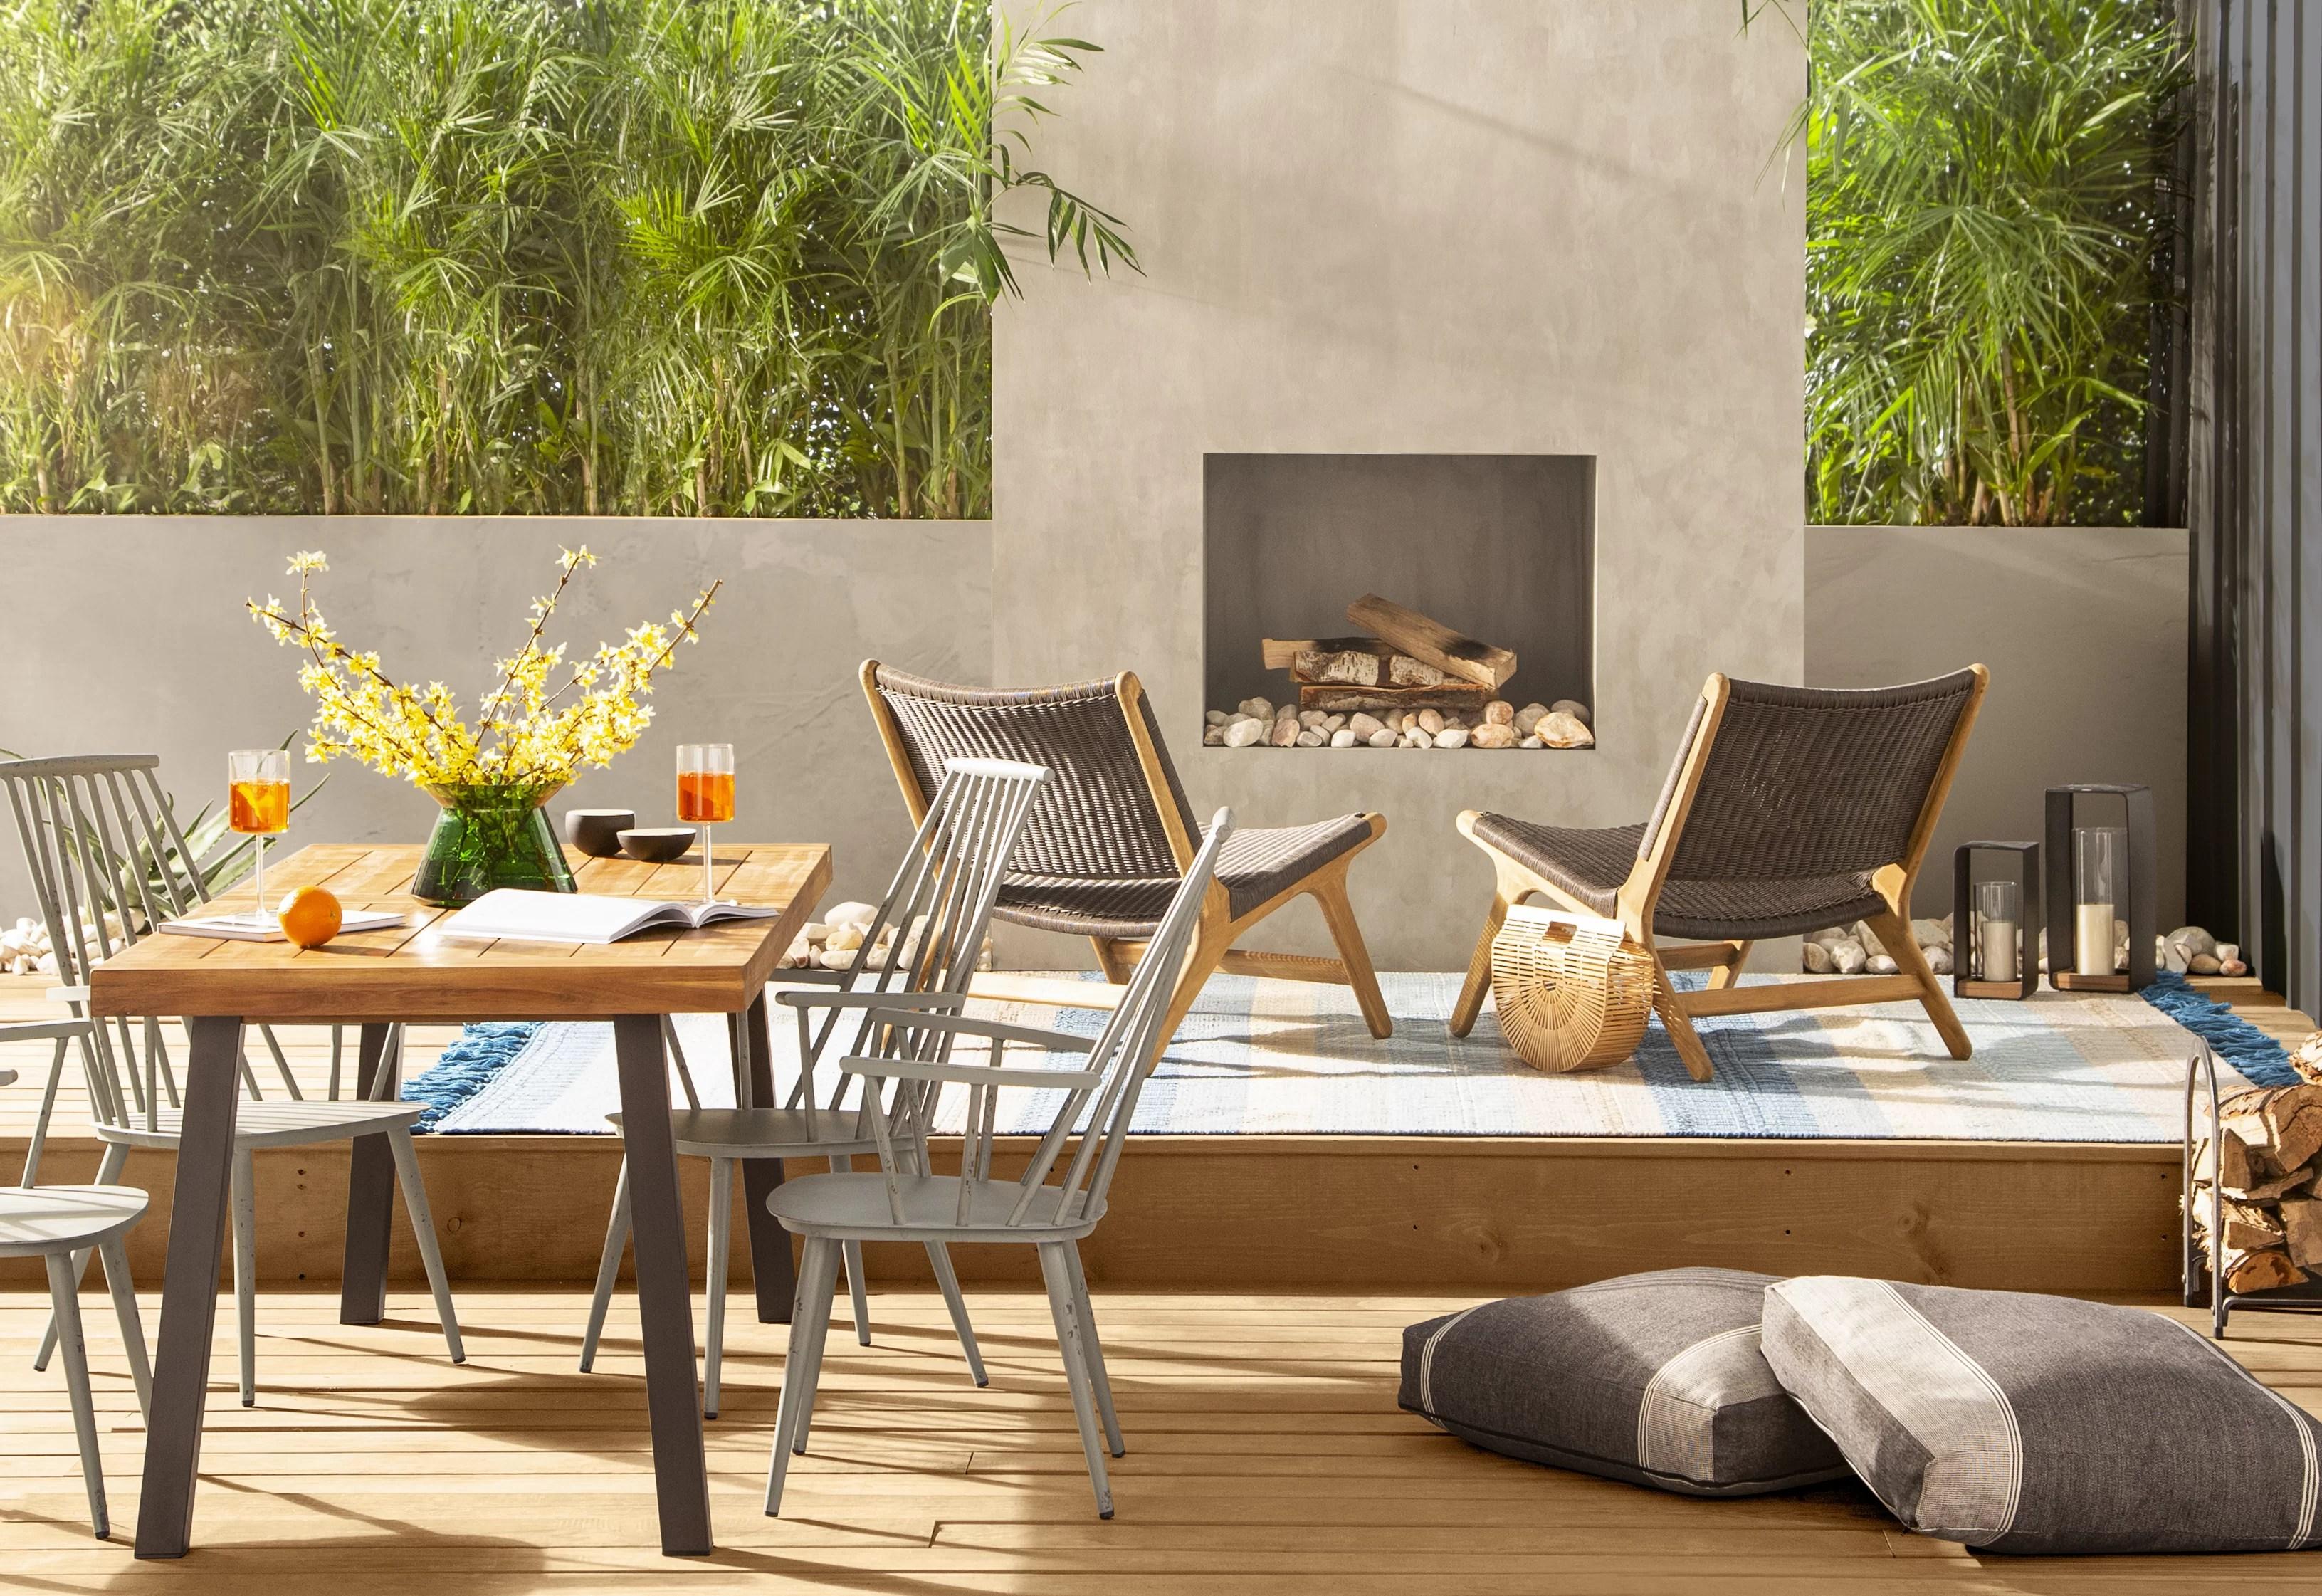 9 outdoor fireplace designs ideas